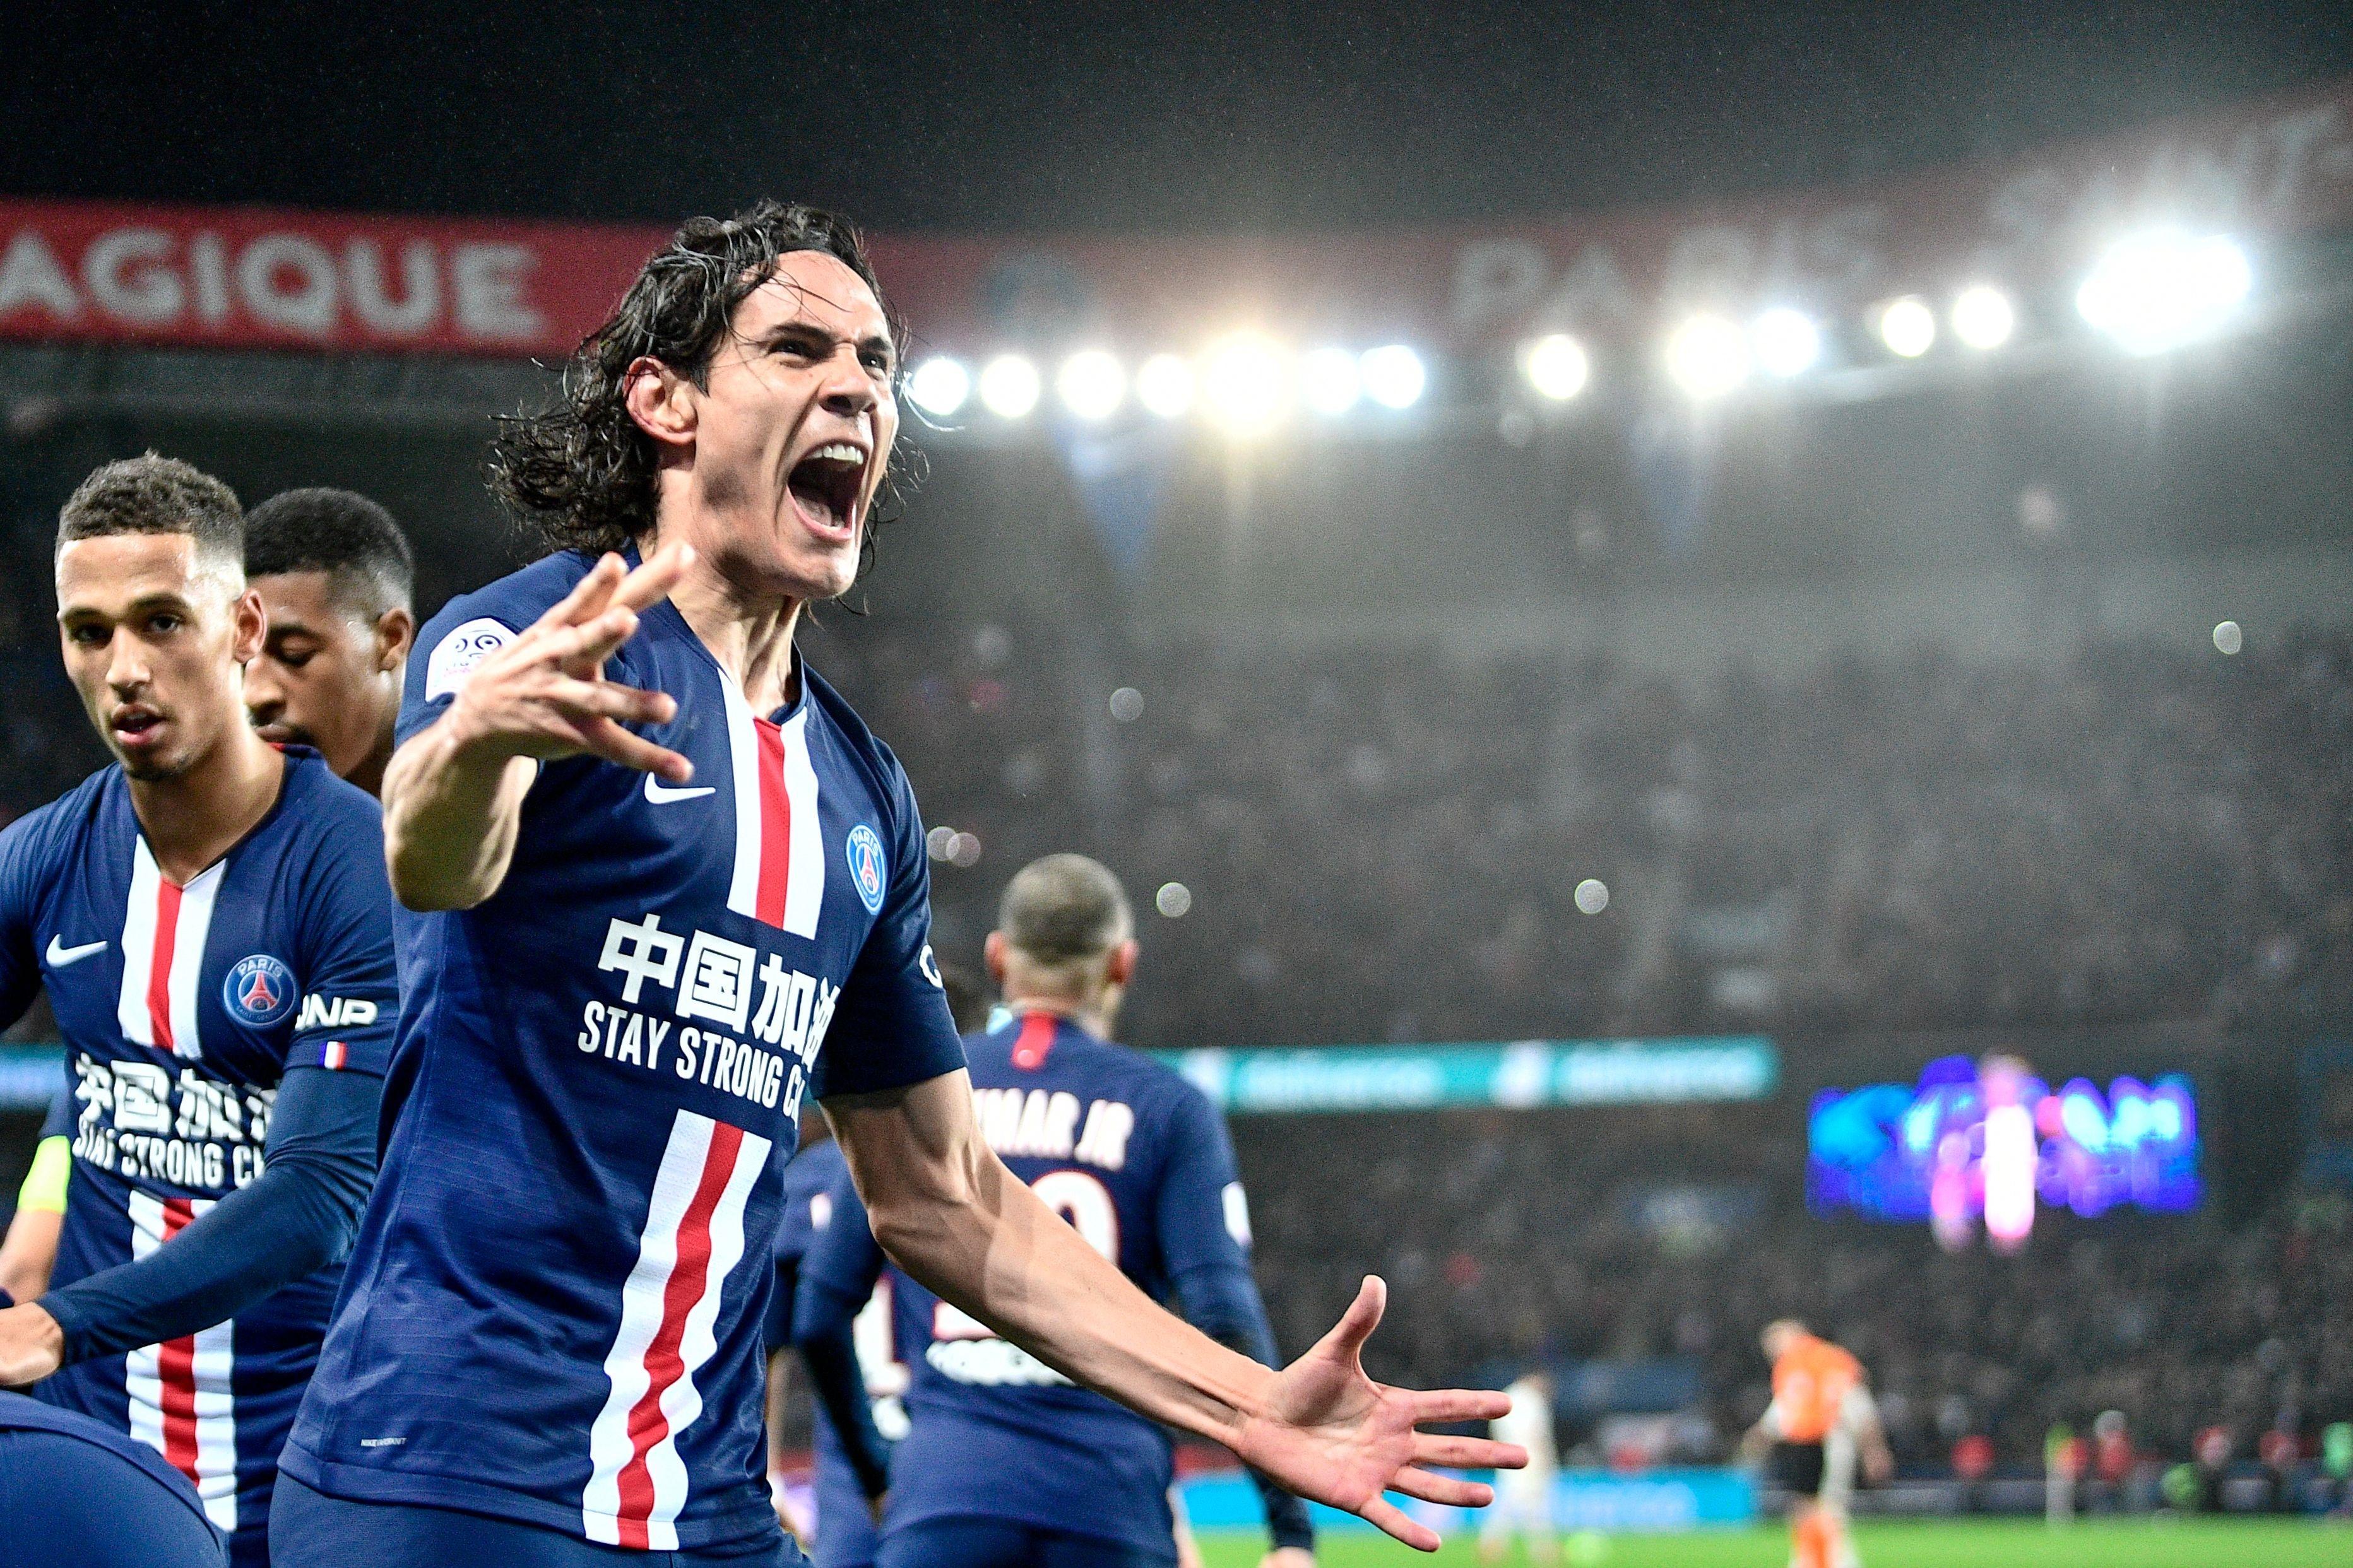 Paris Saint-Germain's Uruguayan forward Edinson Cavani celebrates after a goal during the French L1 football match between Paris Saint-Germain (PSG) and Girondins de Bordeaux at the Parc des Princes stadium in Paris, on February 23, 2020